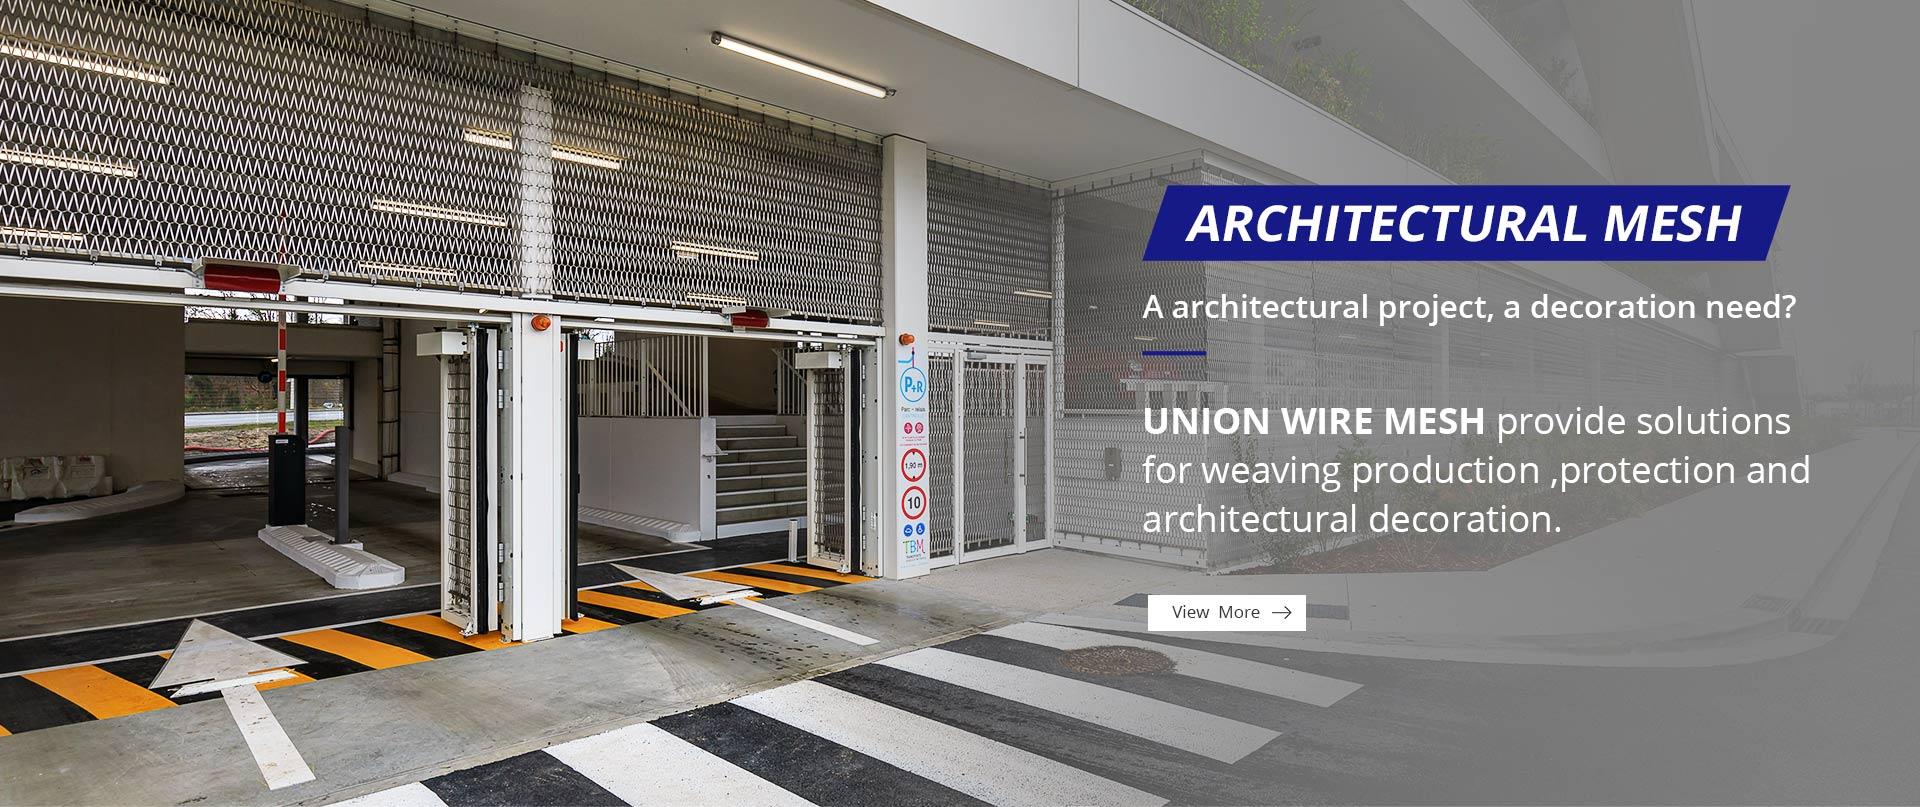 Architectural Mesh